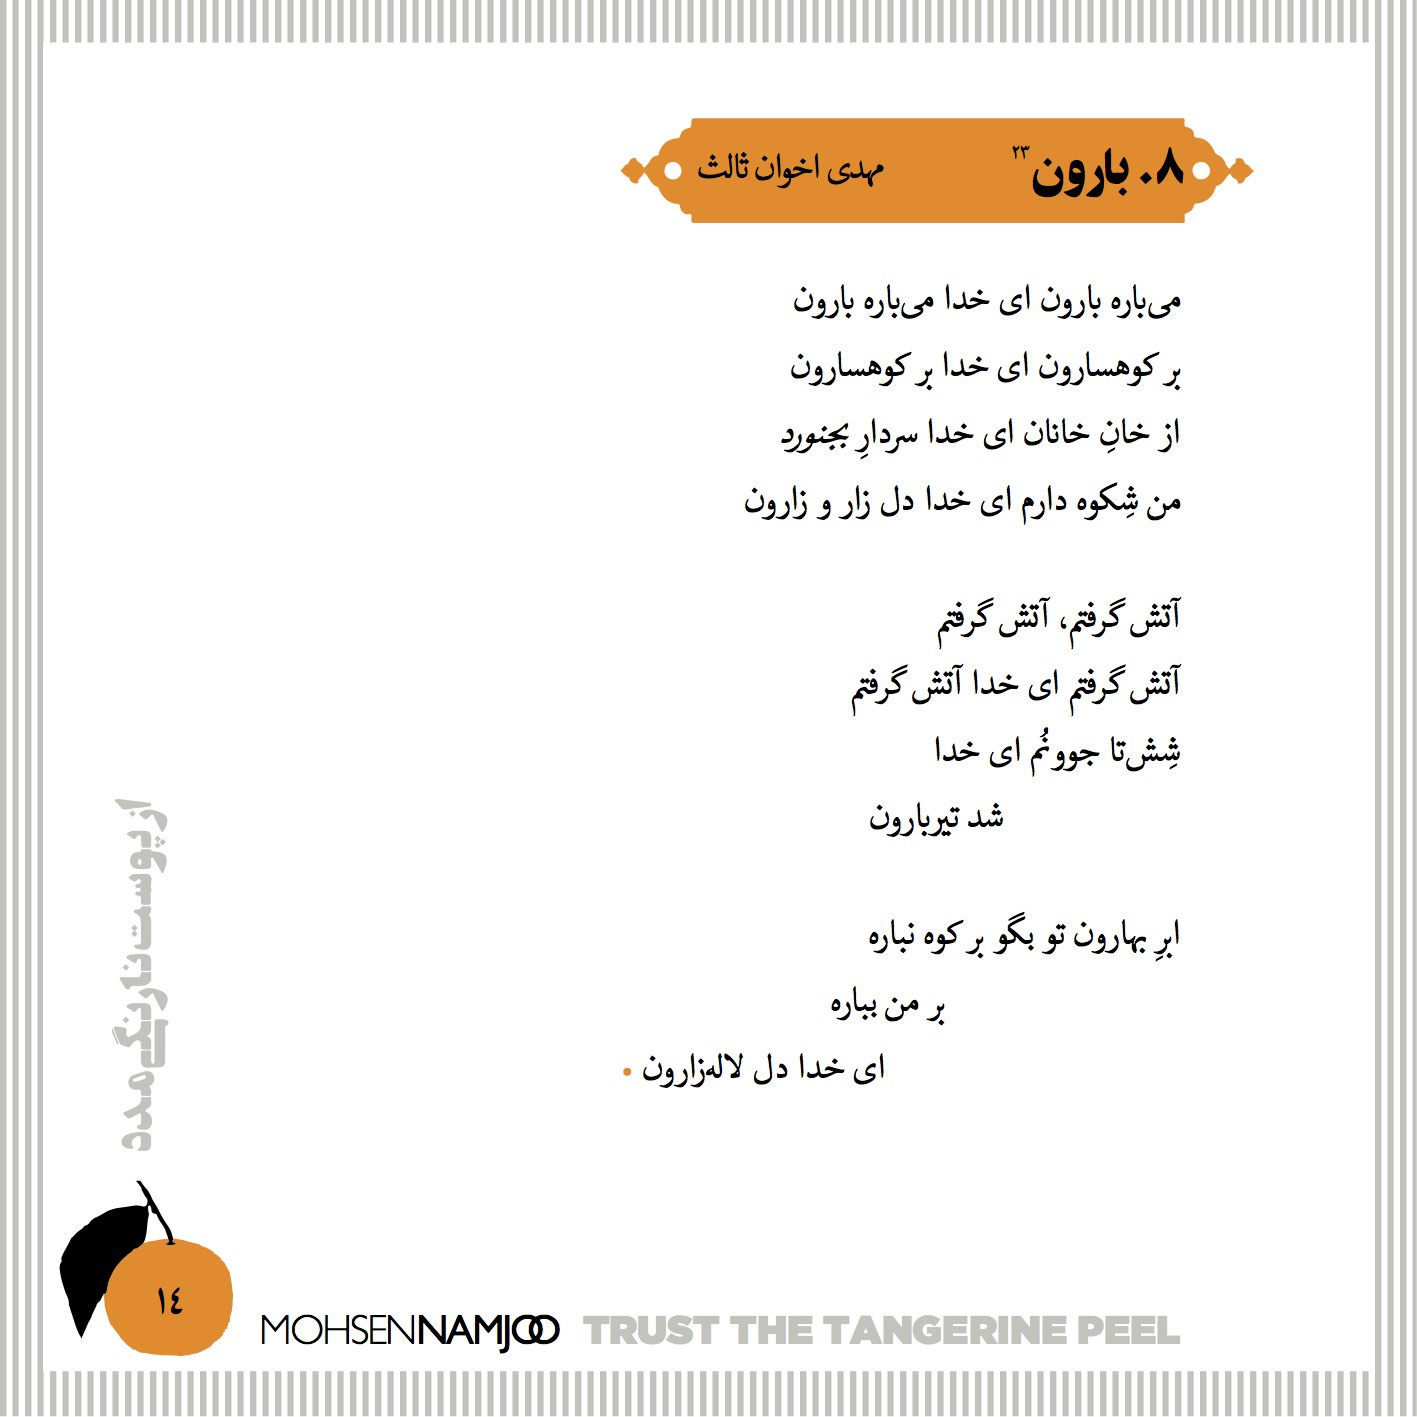 15-Trust the Tangerine Peel Final.jpg